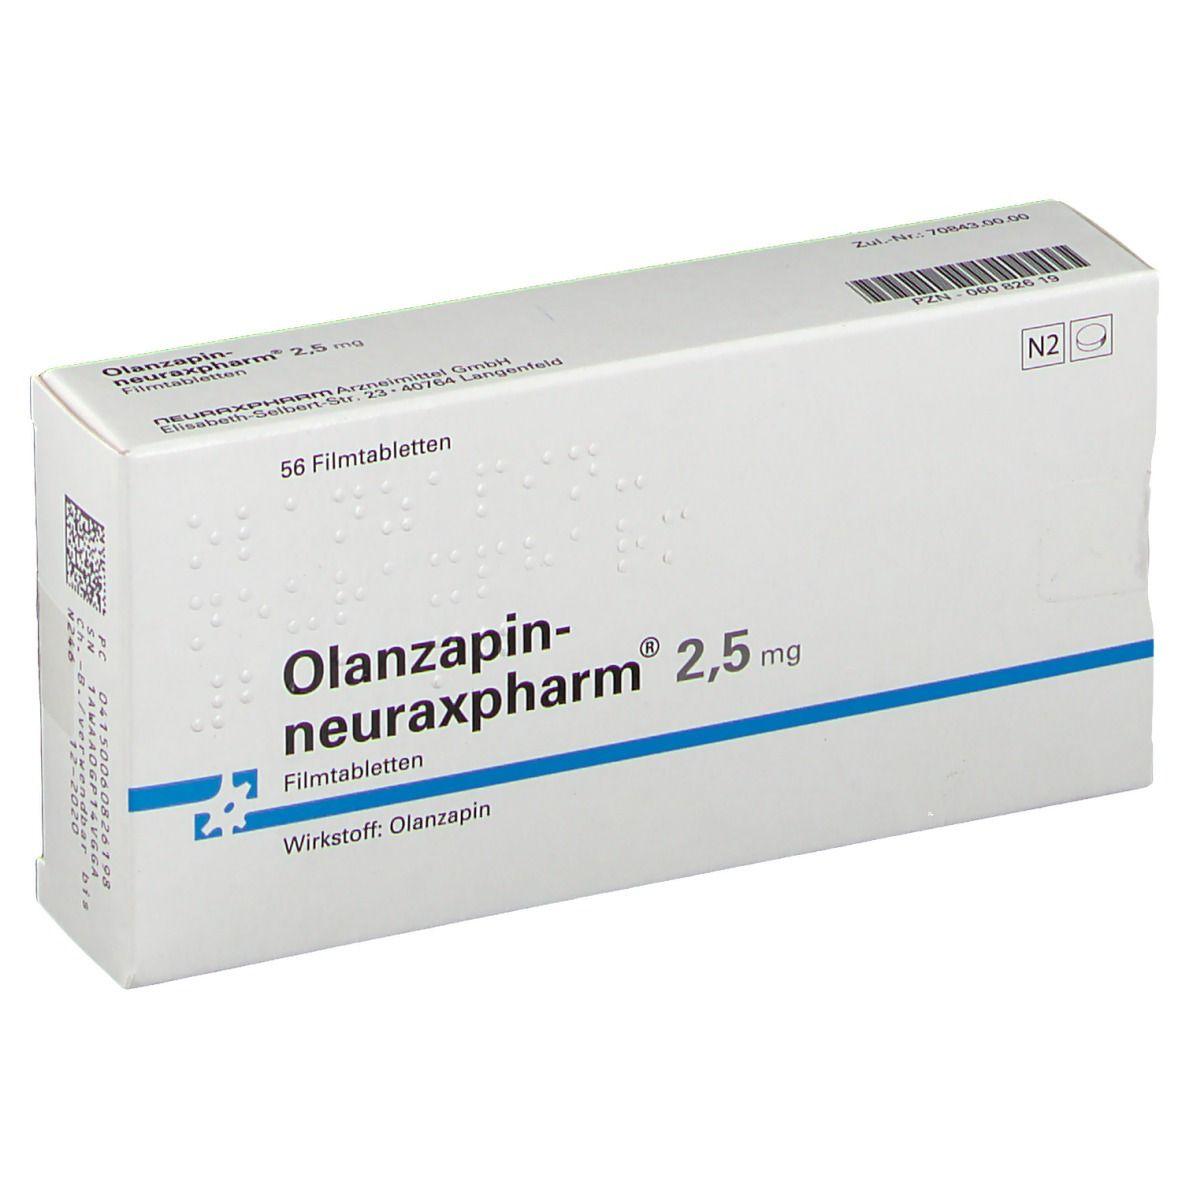 OLANZAPIN-NEURAX 2.5 MG